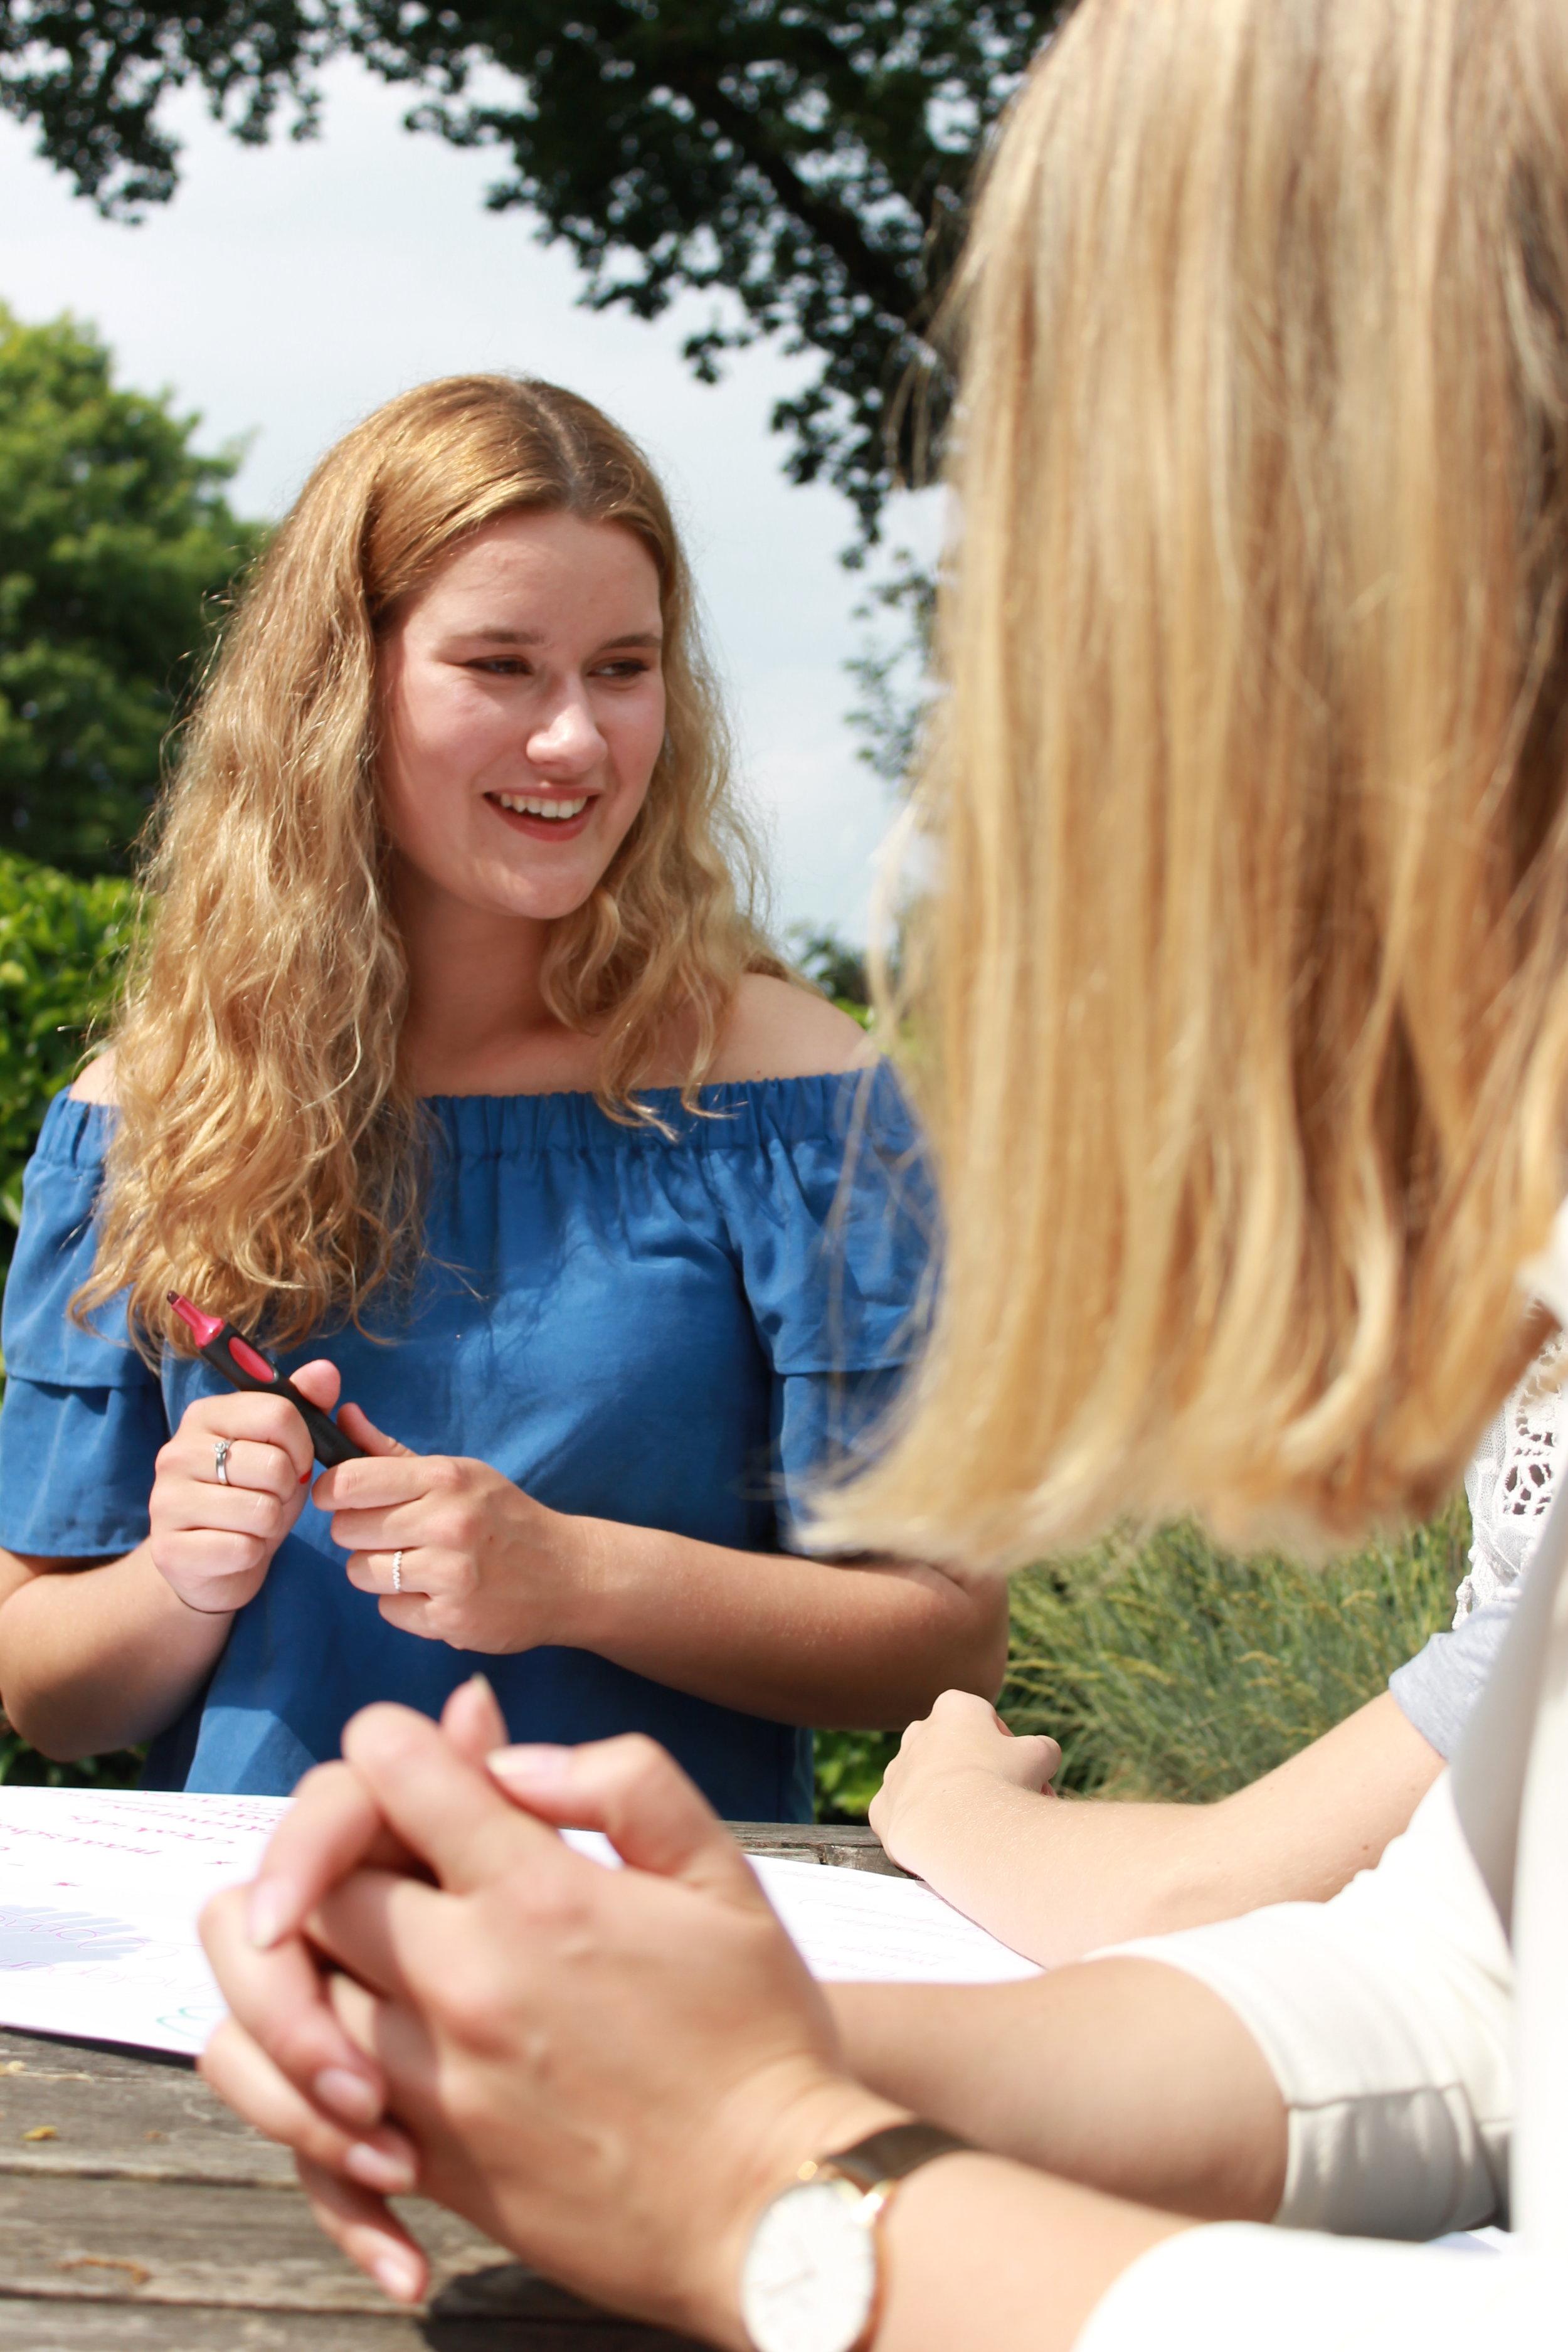 Laura Wierda Motivatiecoach uitstelgedrag motivatie